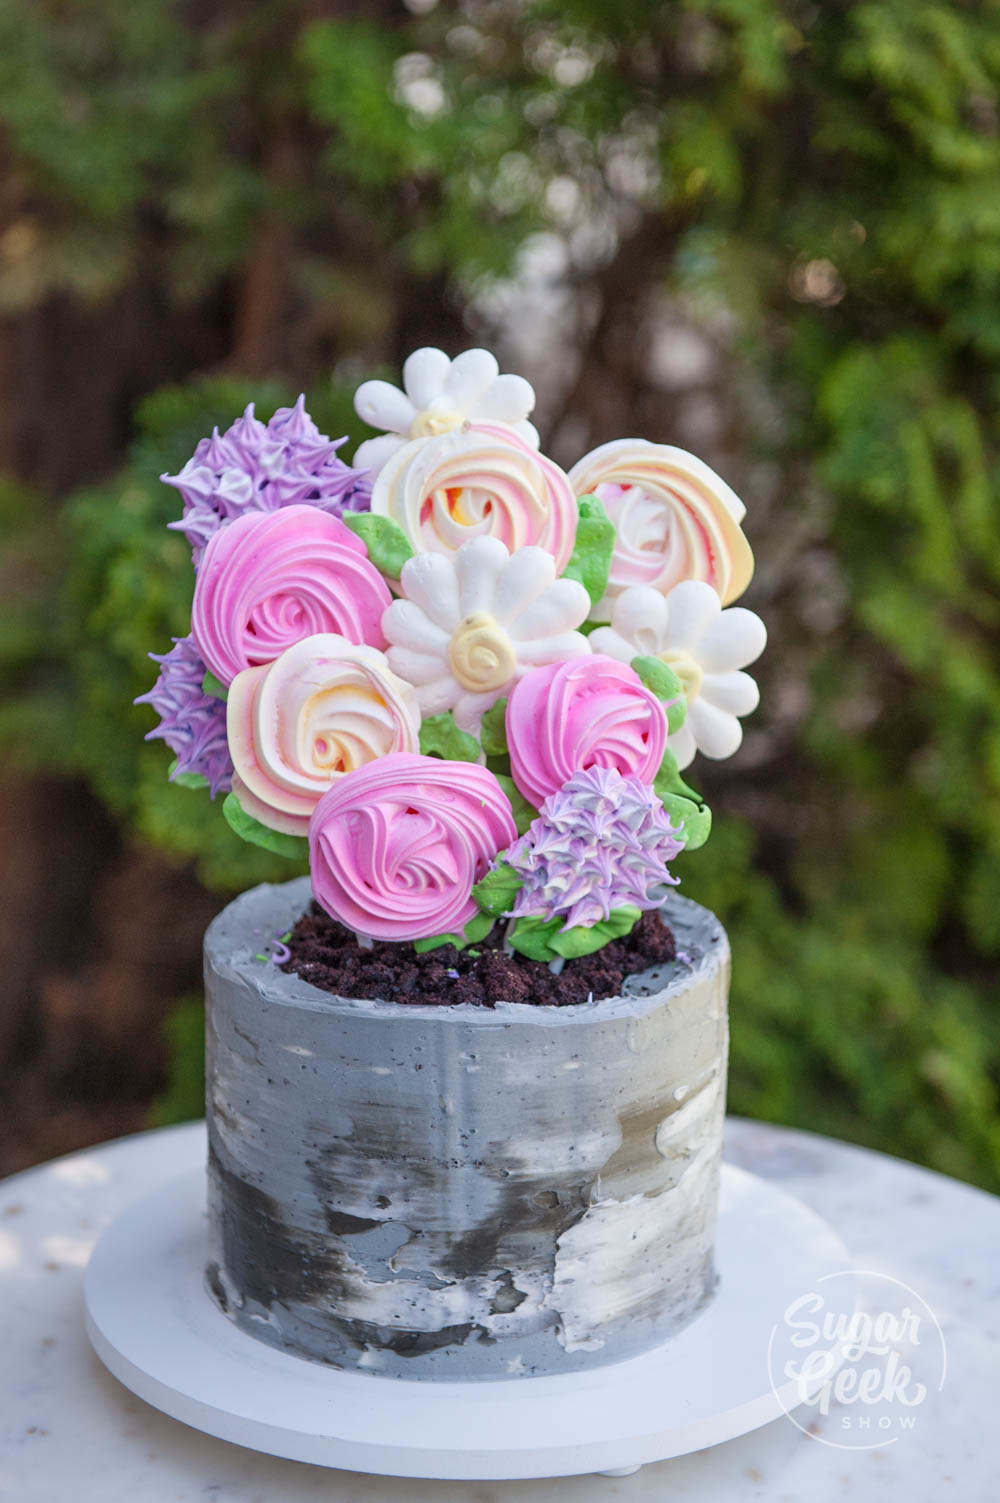 Flower Meringue Pops And Concrete Flower Pot Cake Tutorial Sugar Geek Show